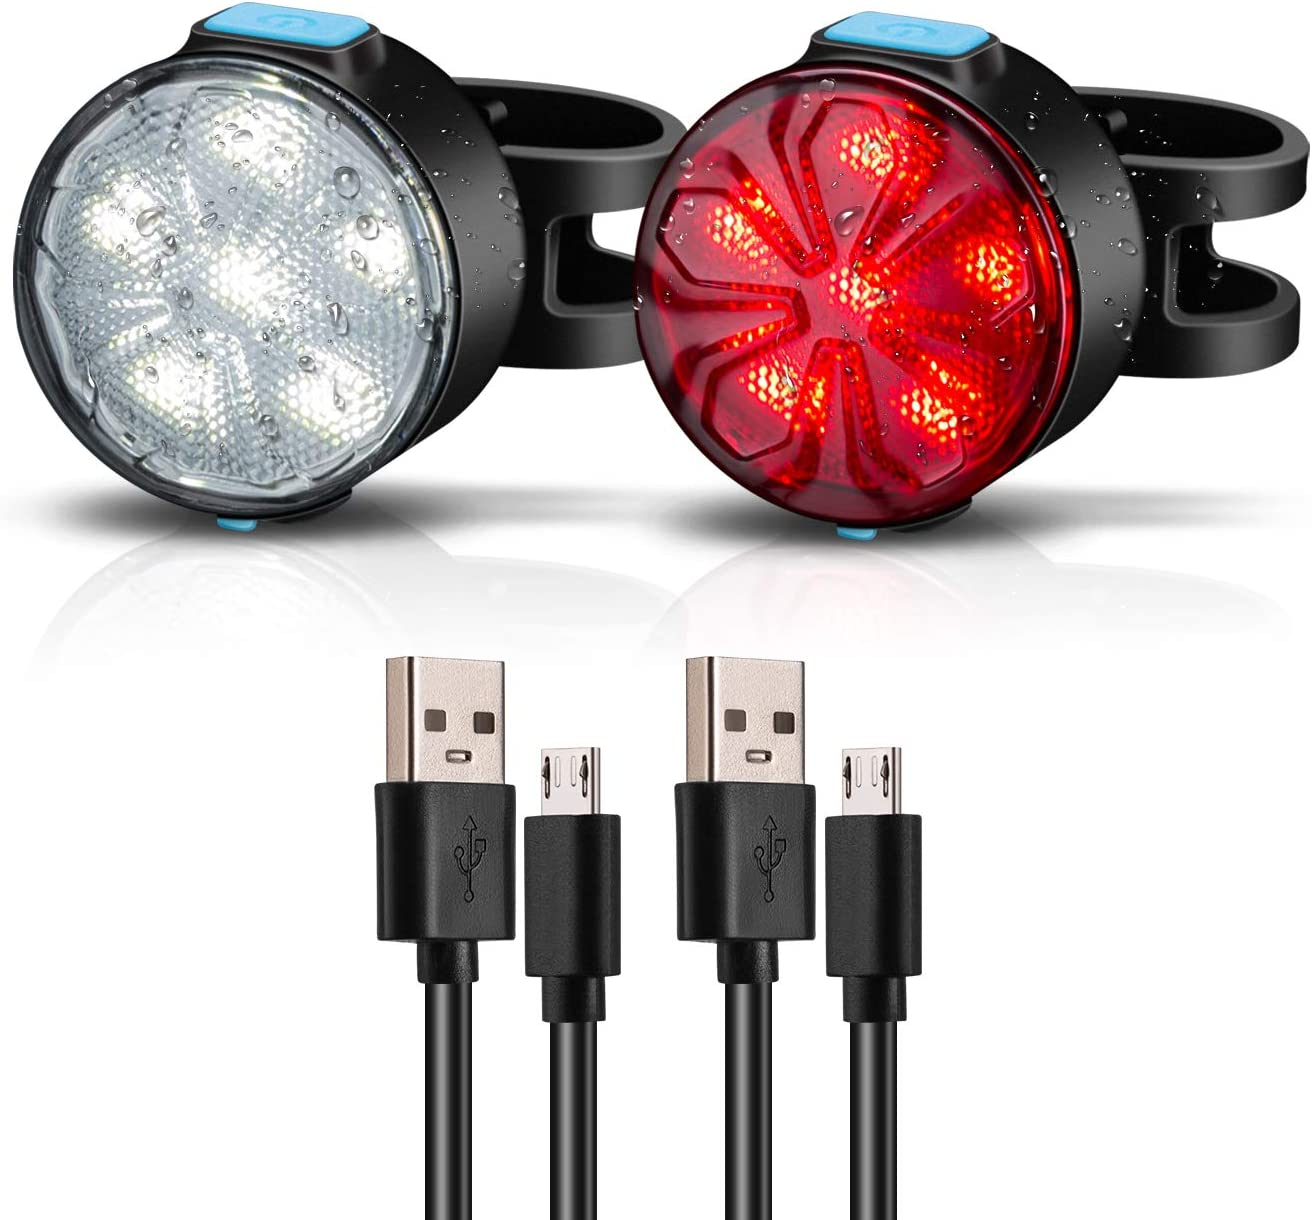 Aiguozer 2021 new 2 Pack USB Rechargeable Bike Lights Set Milwaukee Mall LED Light